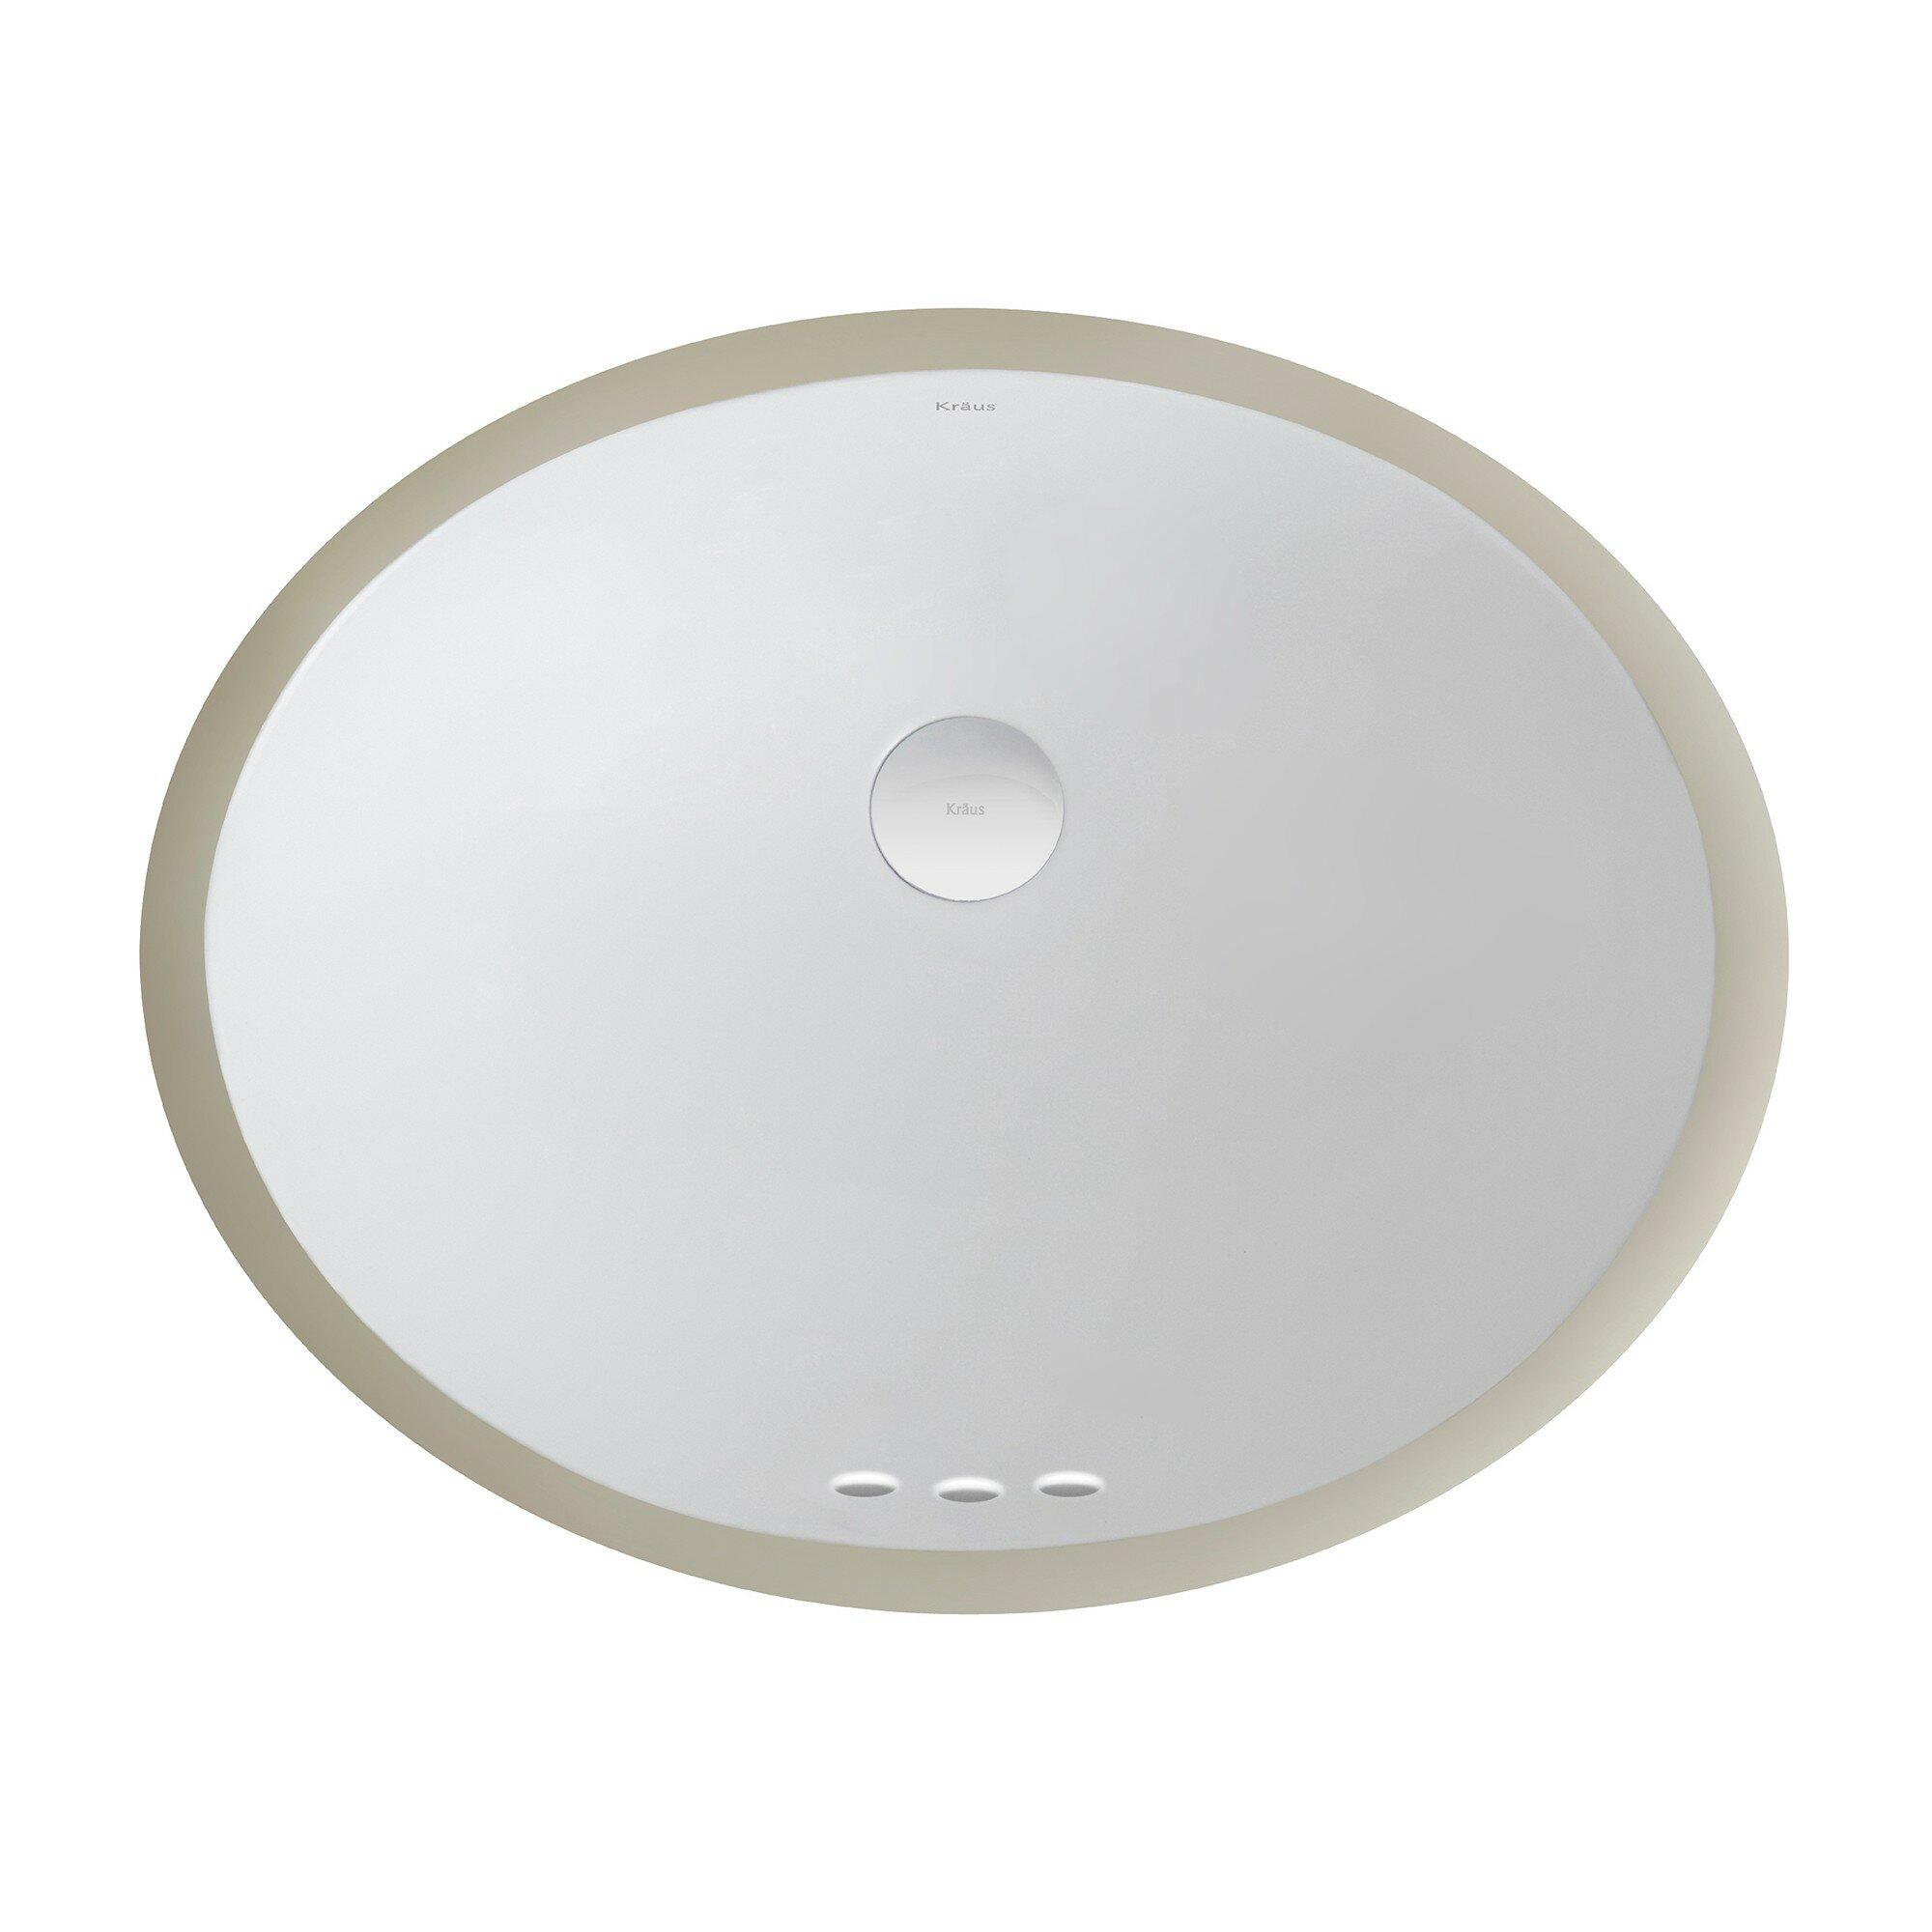 Kraus Elavo? Ceramic Oval Undermount Bathroom Sink with Overflow ...